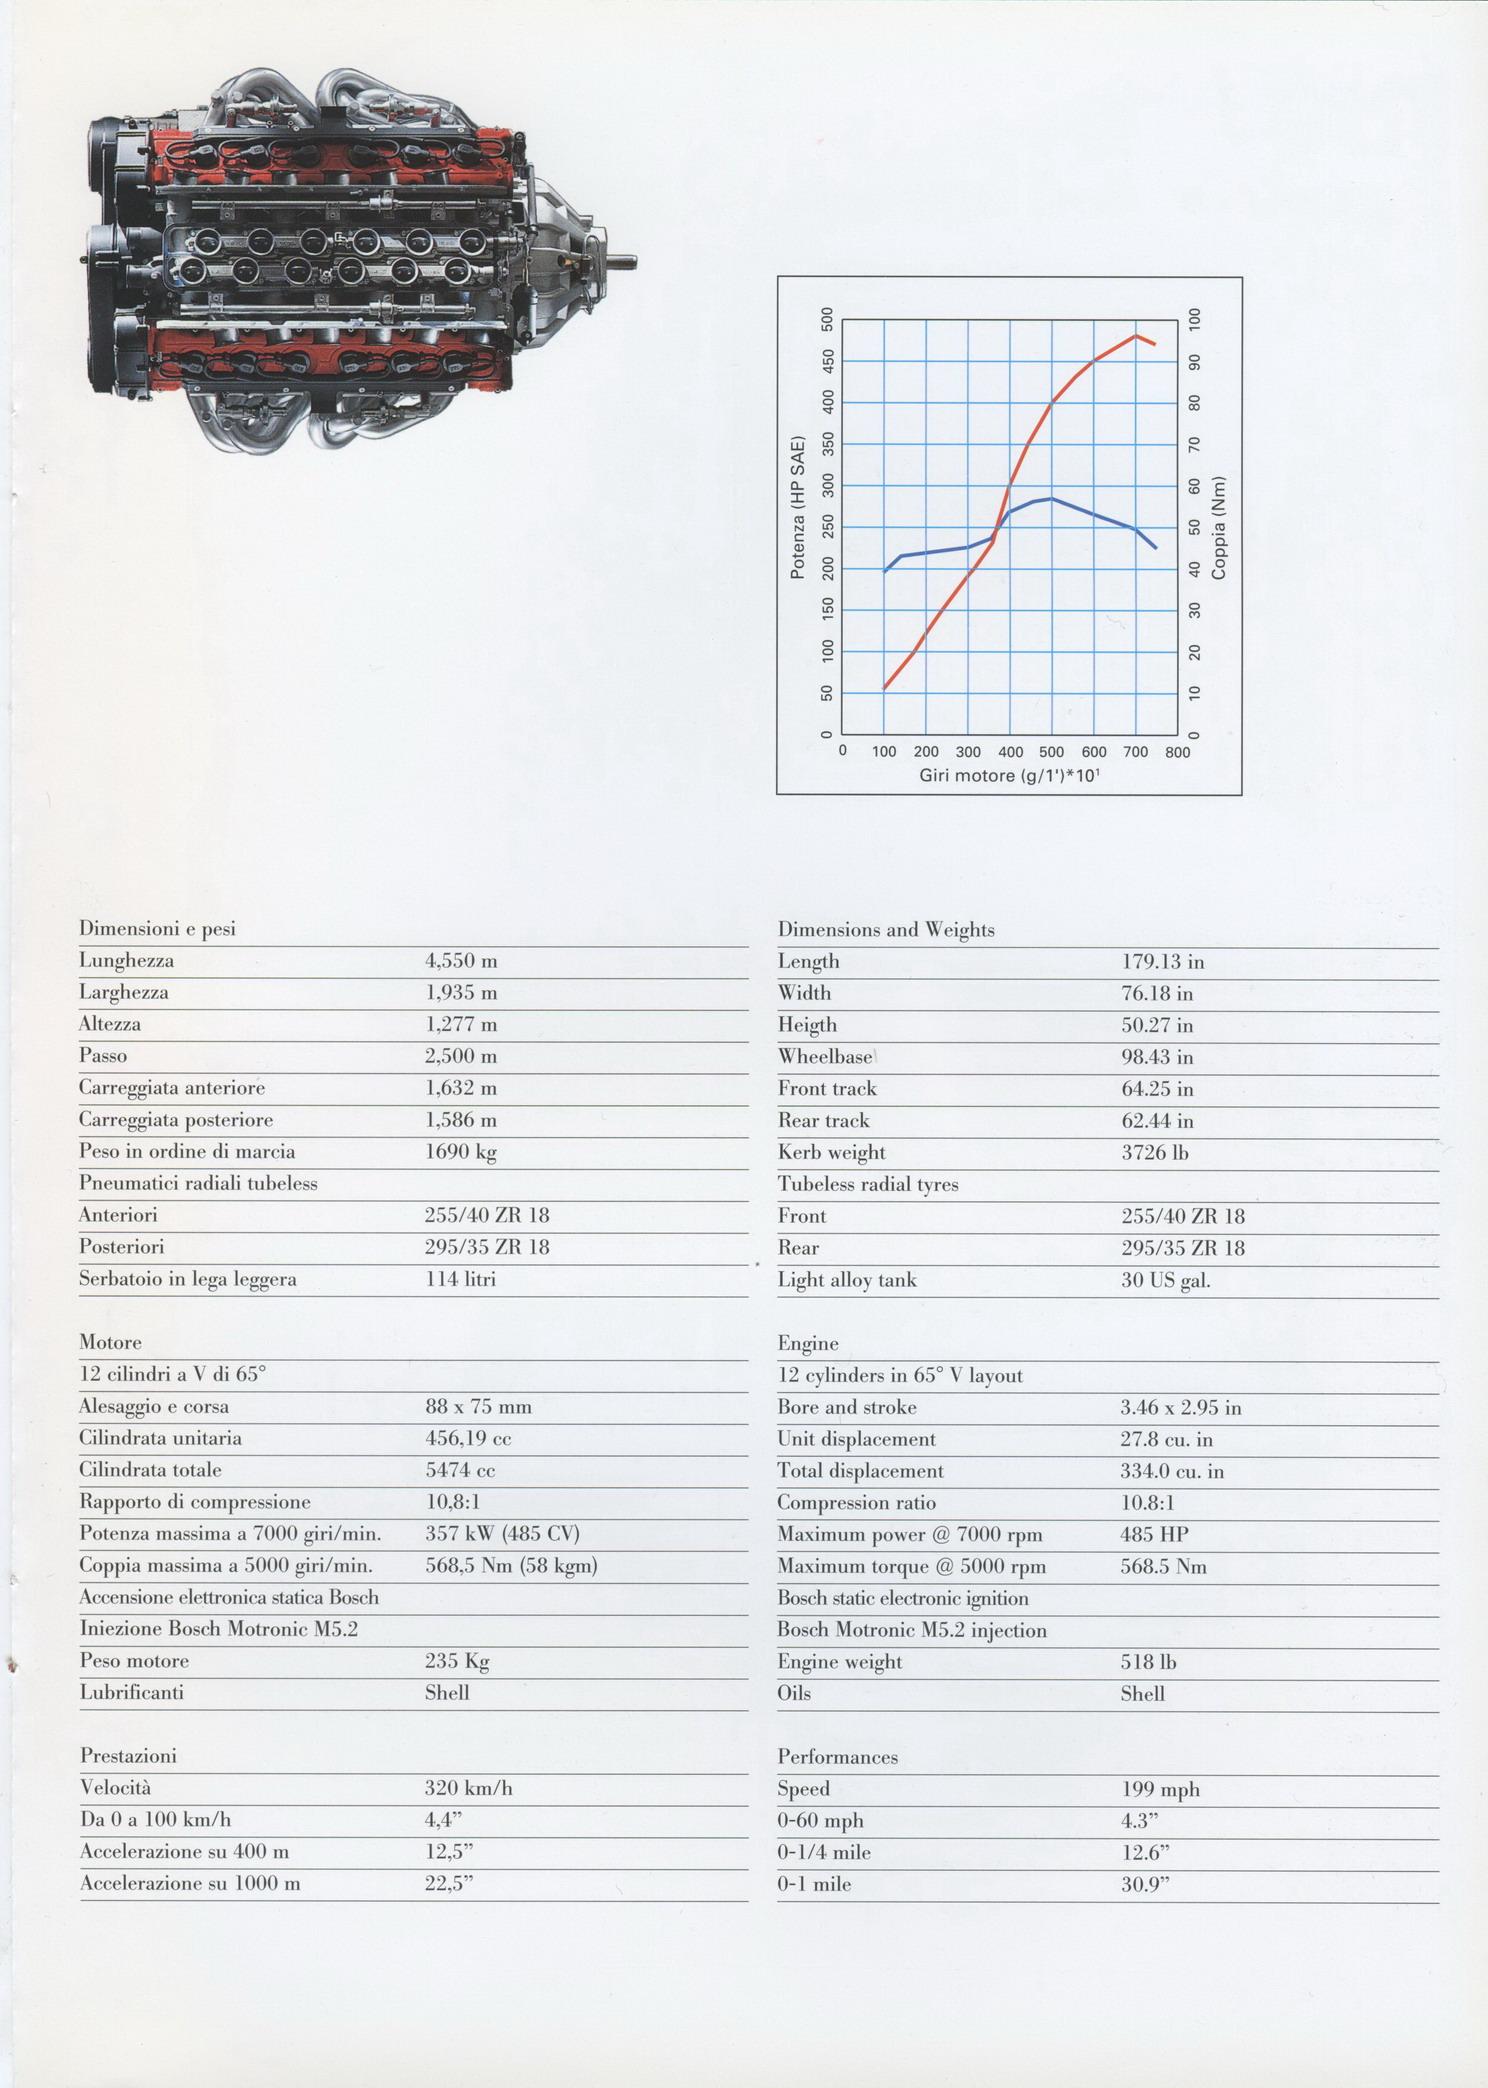 1998 Ferrari brochure